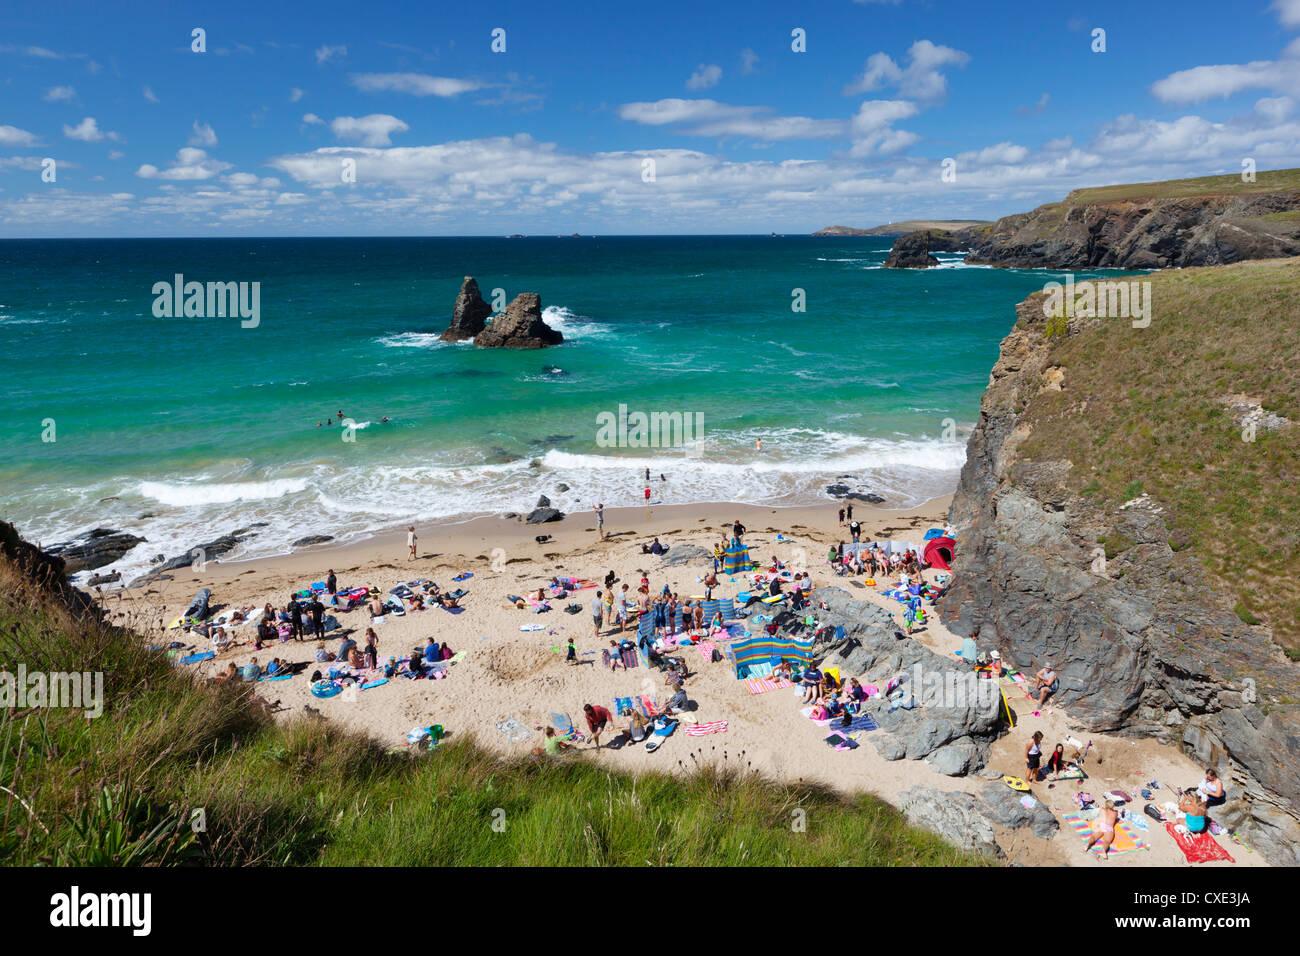 Small beach on North Cornwall coast, Porthcothan, near Newquay, Cornwall, England - Stock Image